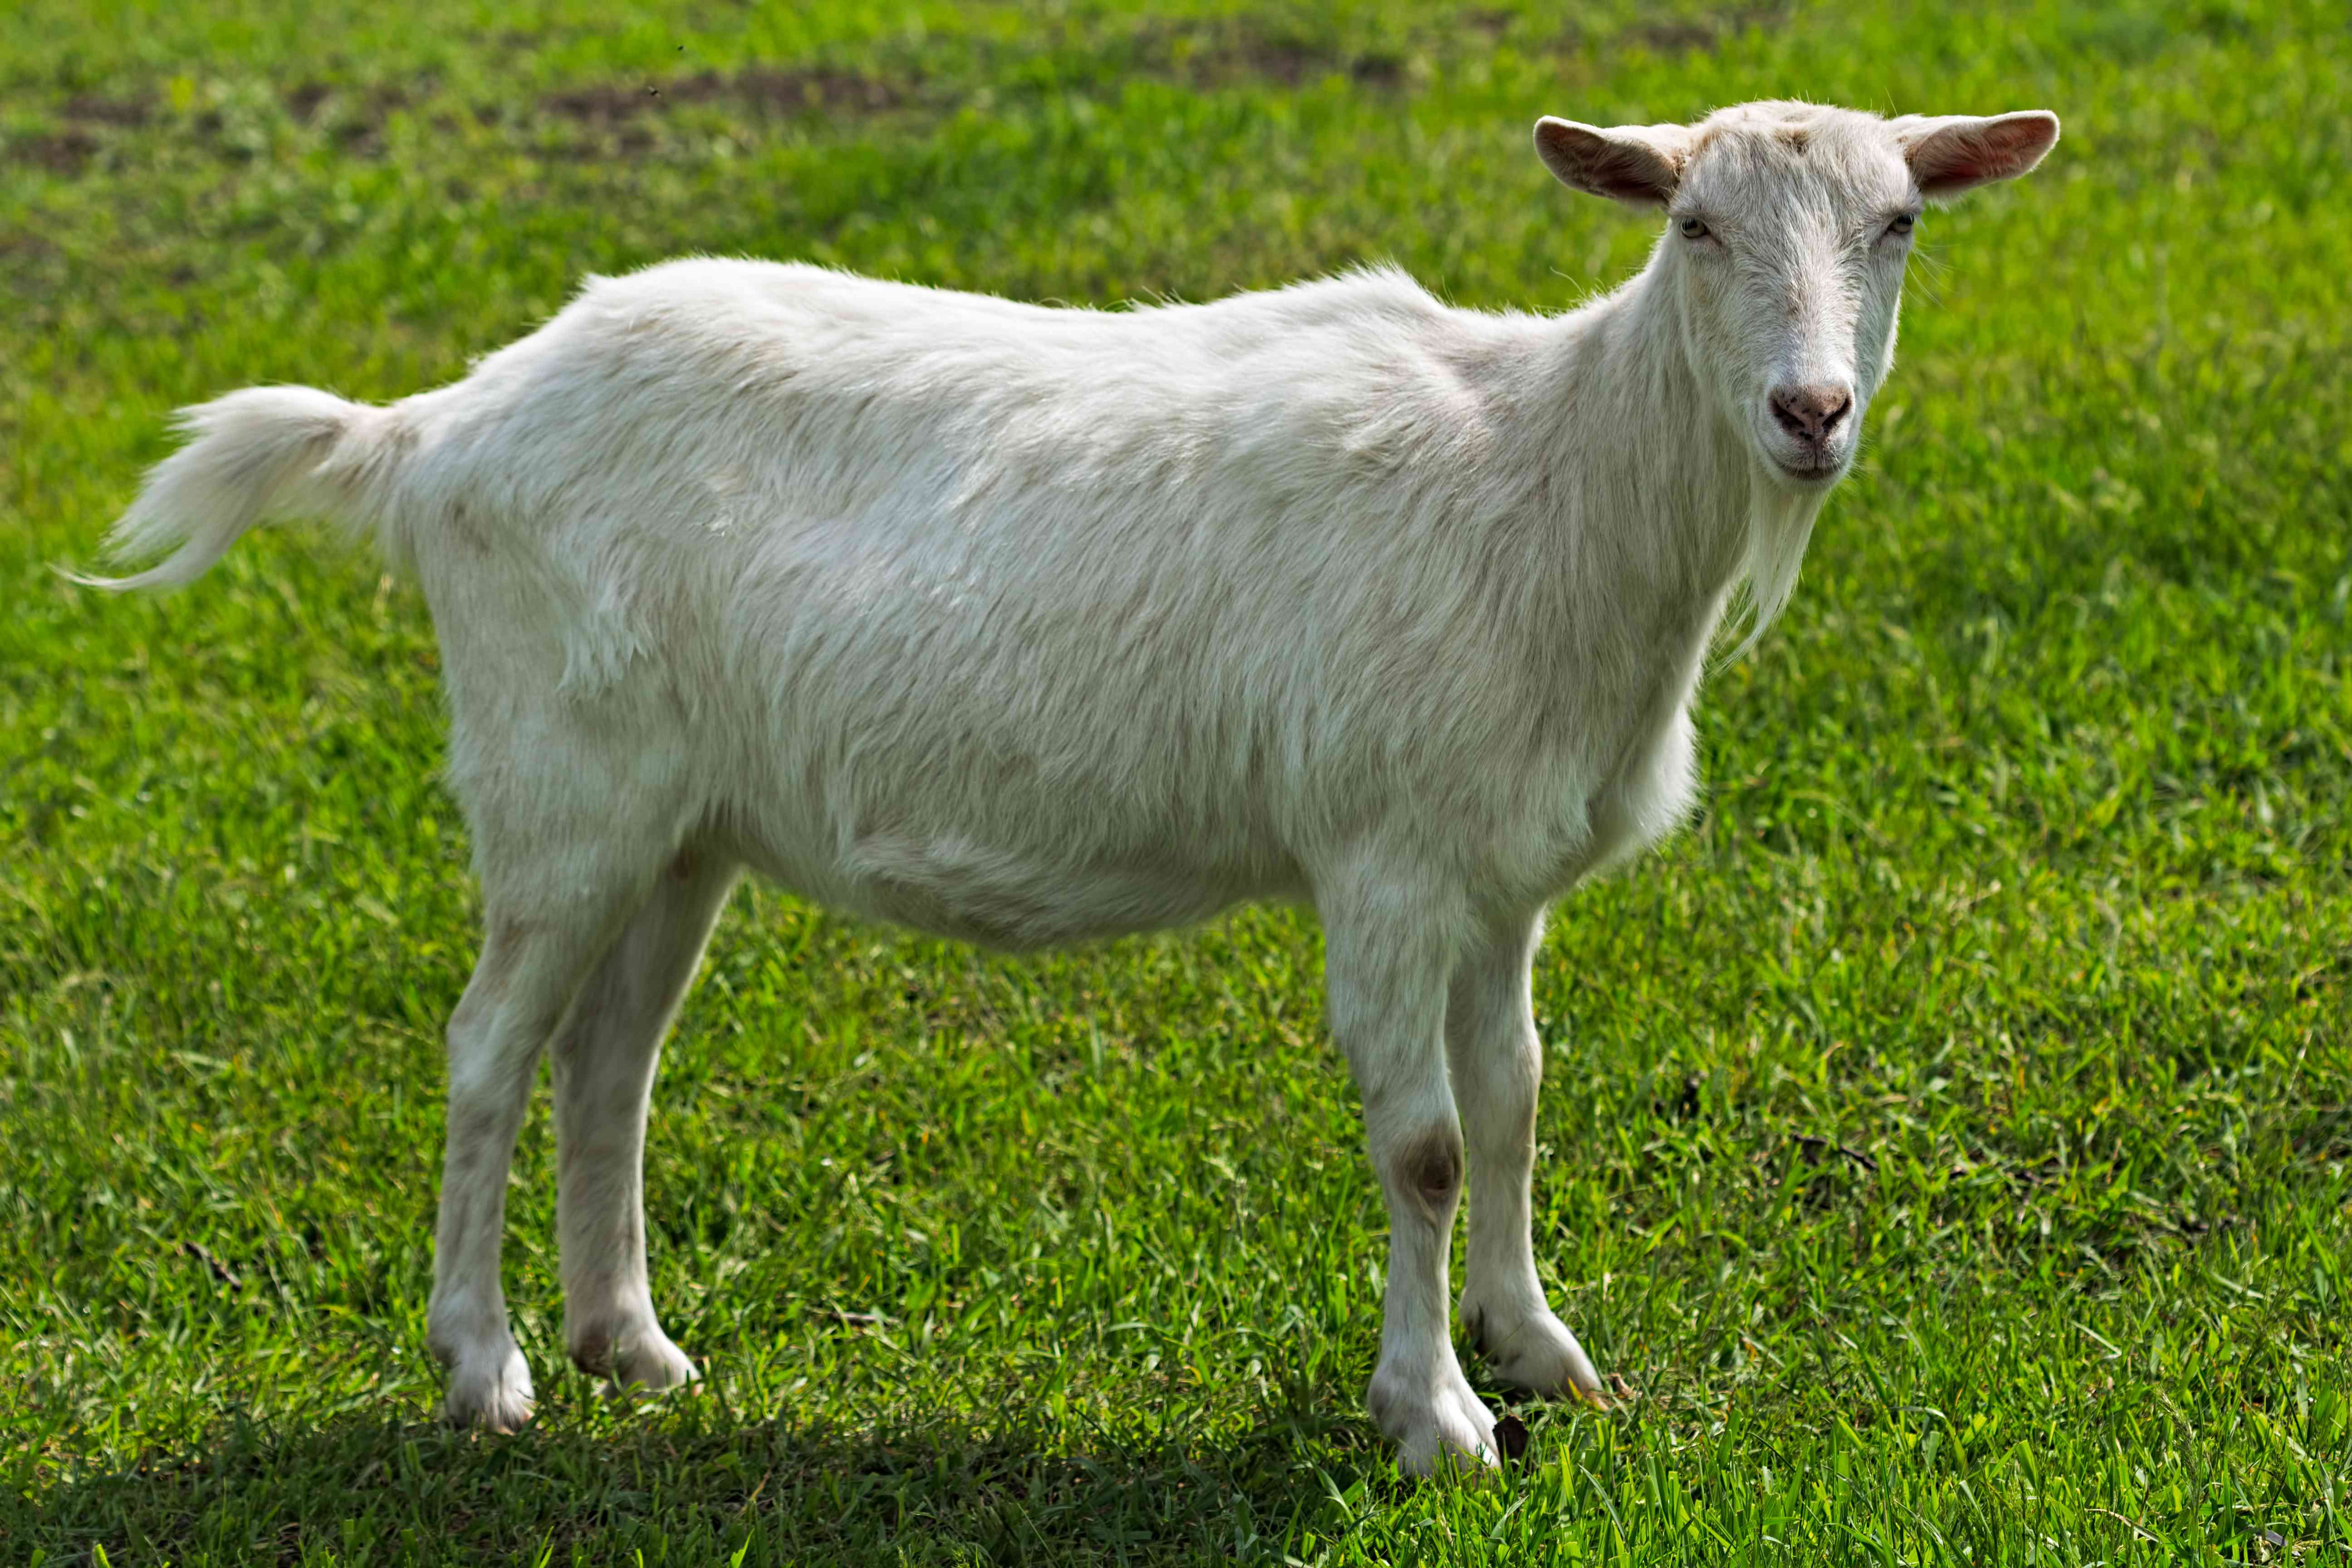 Young Saanen goat standing on green grass